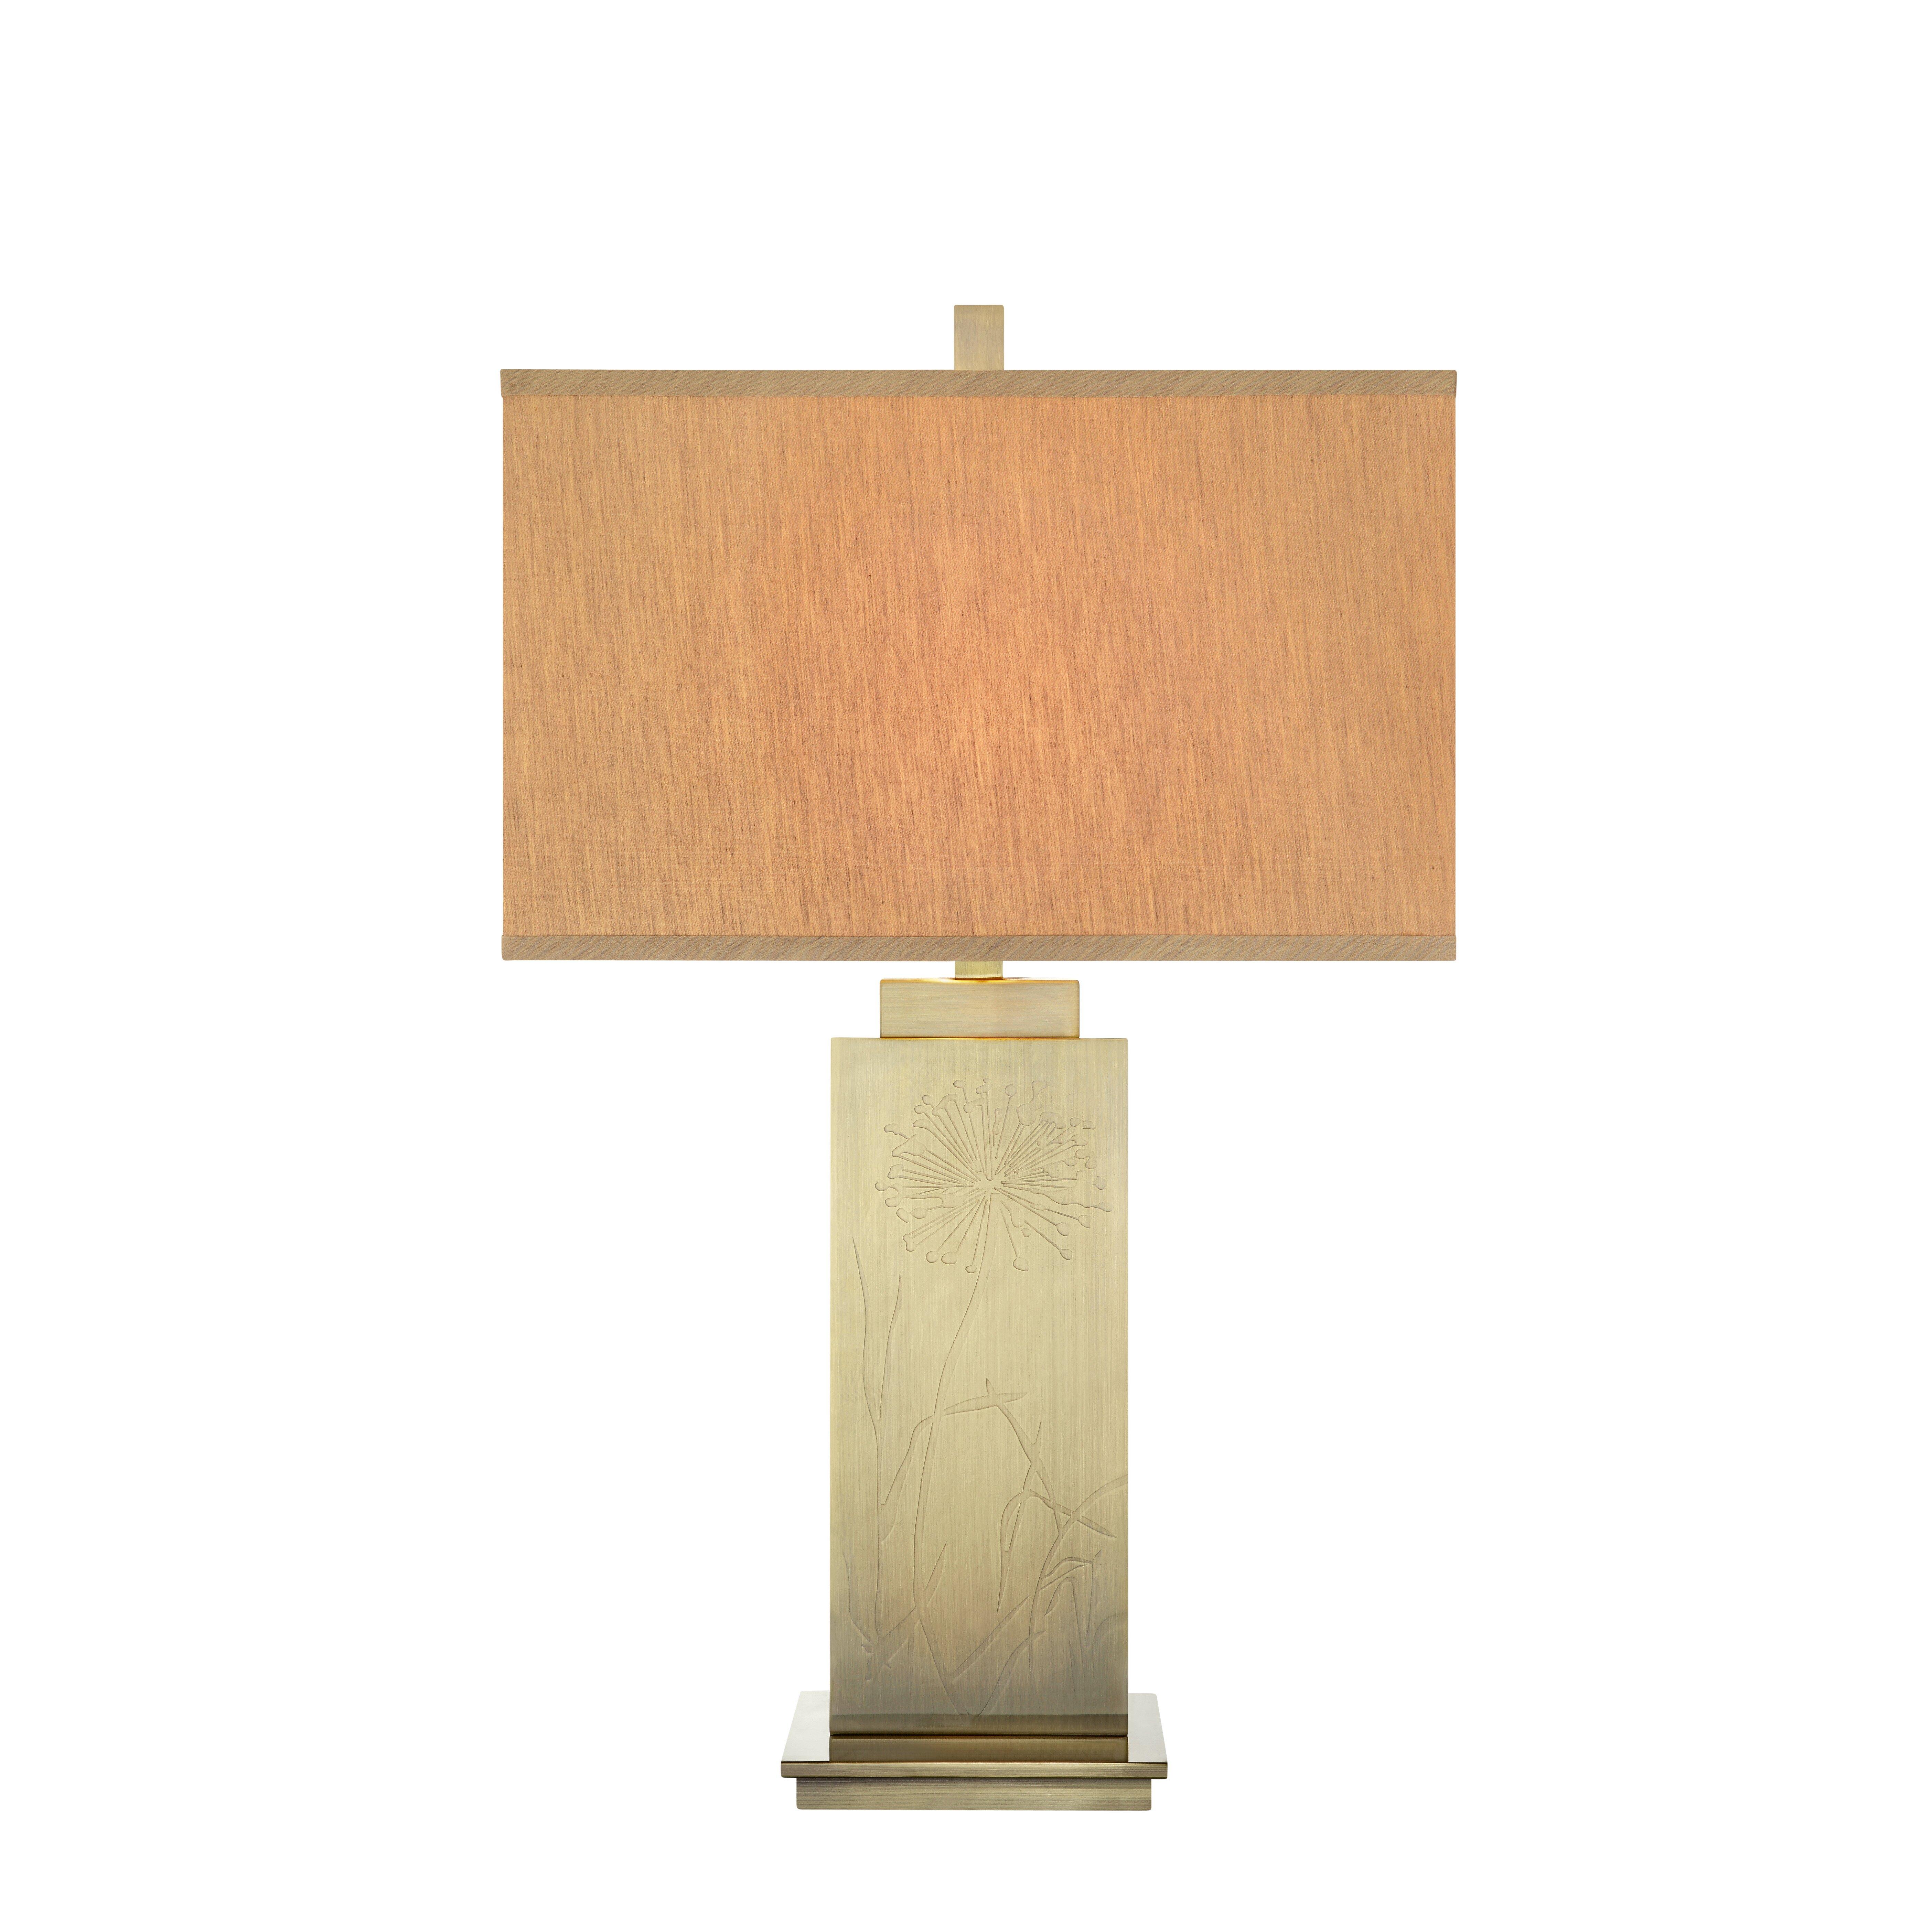 lighting lamps table lamps catalina lighting sku ilum1176. Black Bedroom Furniture Sets. Home Design Ideas